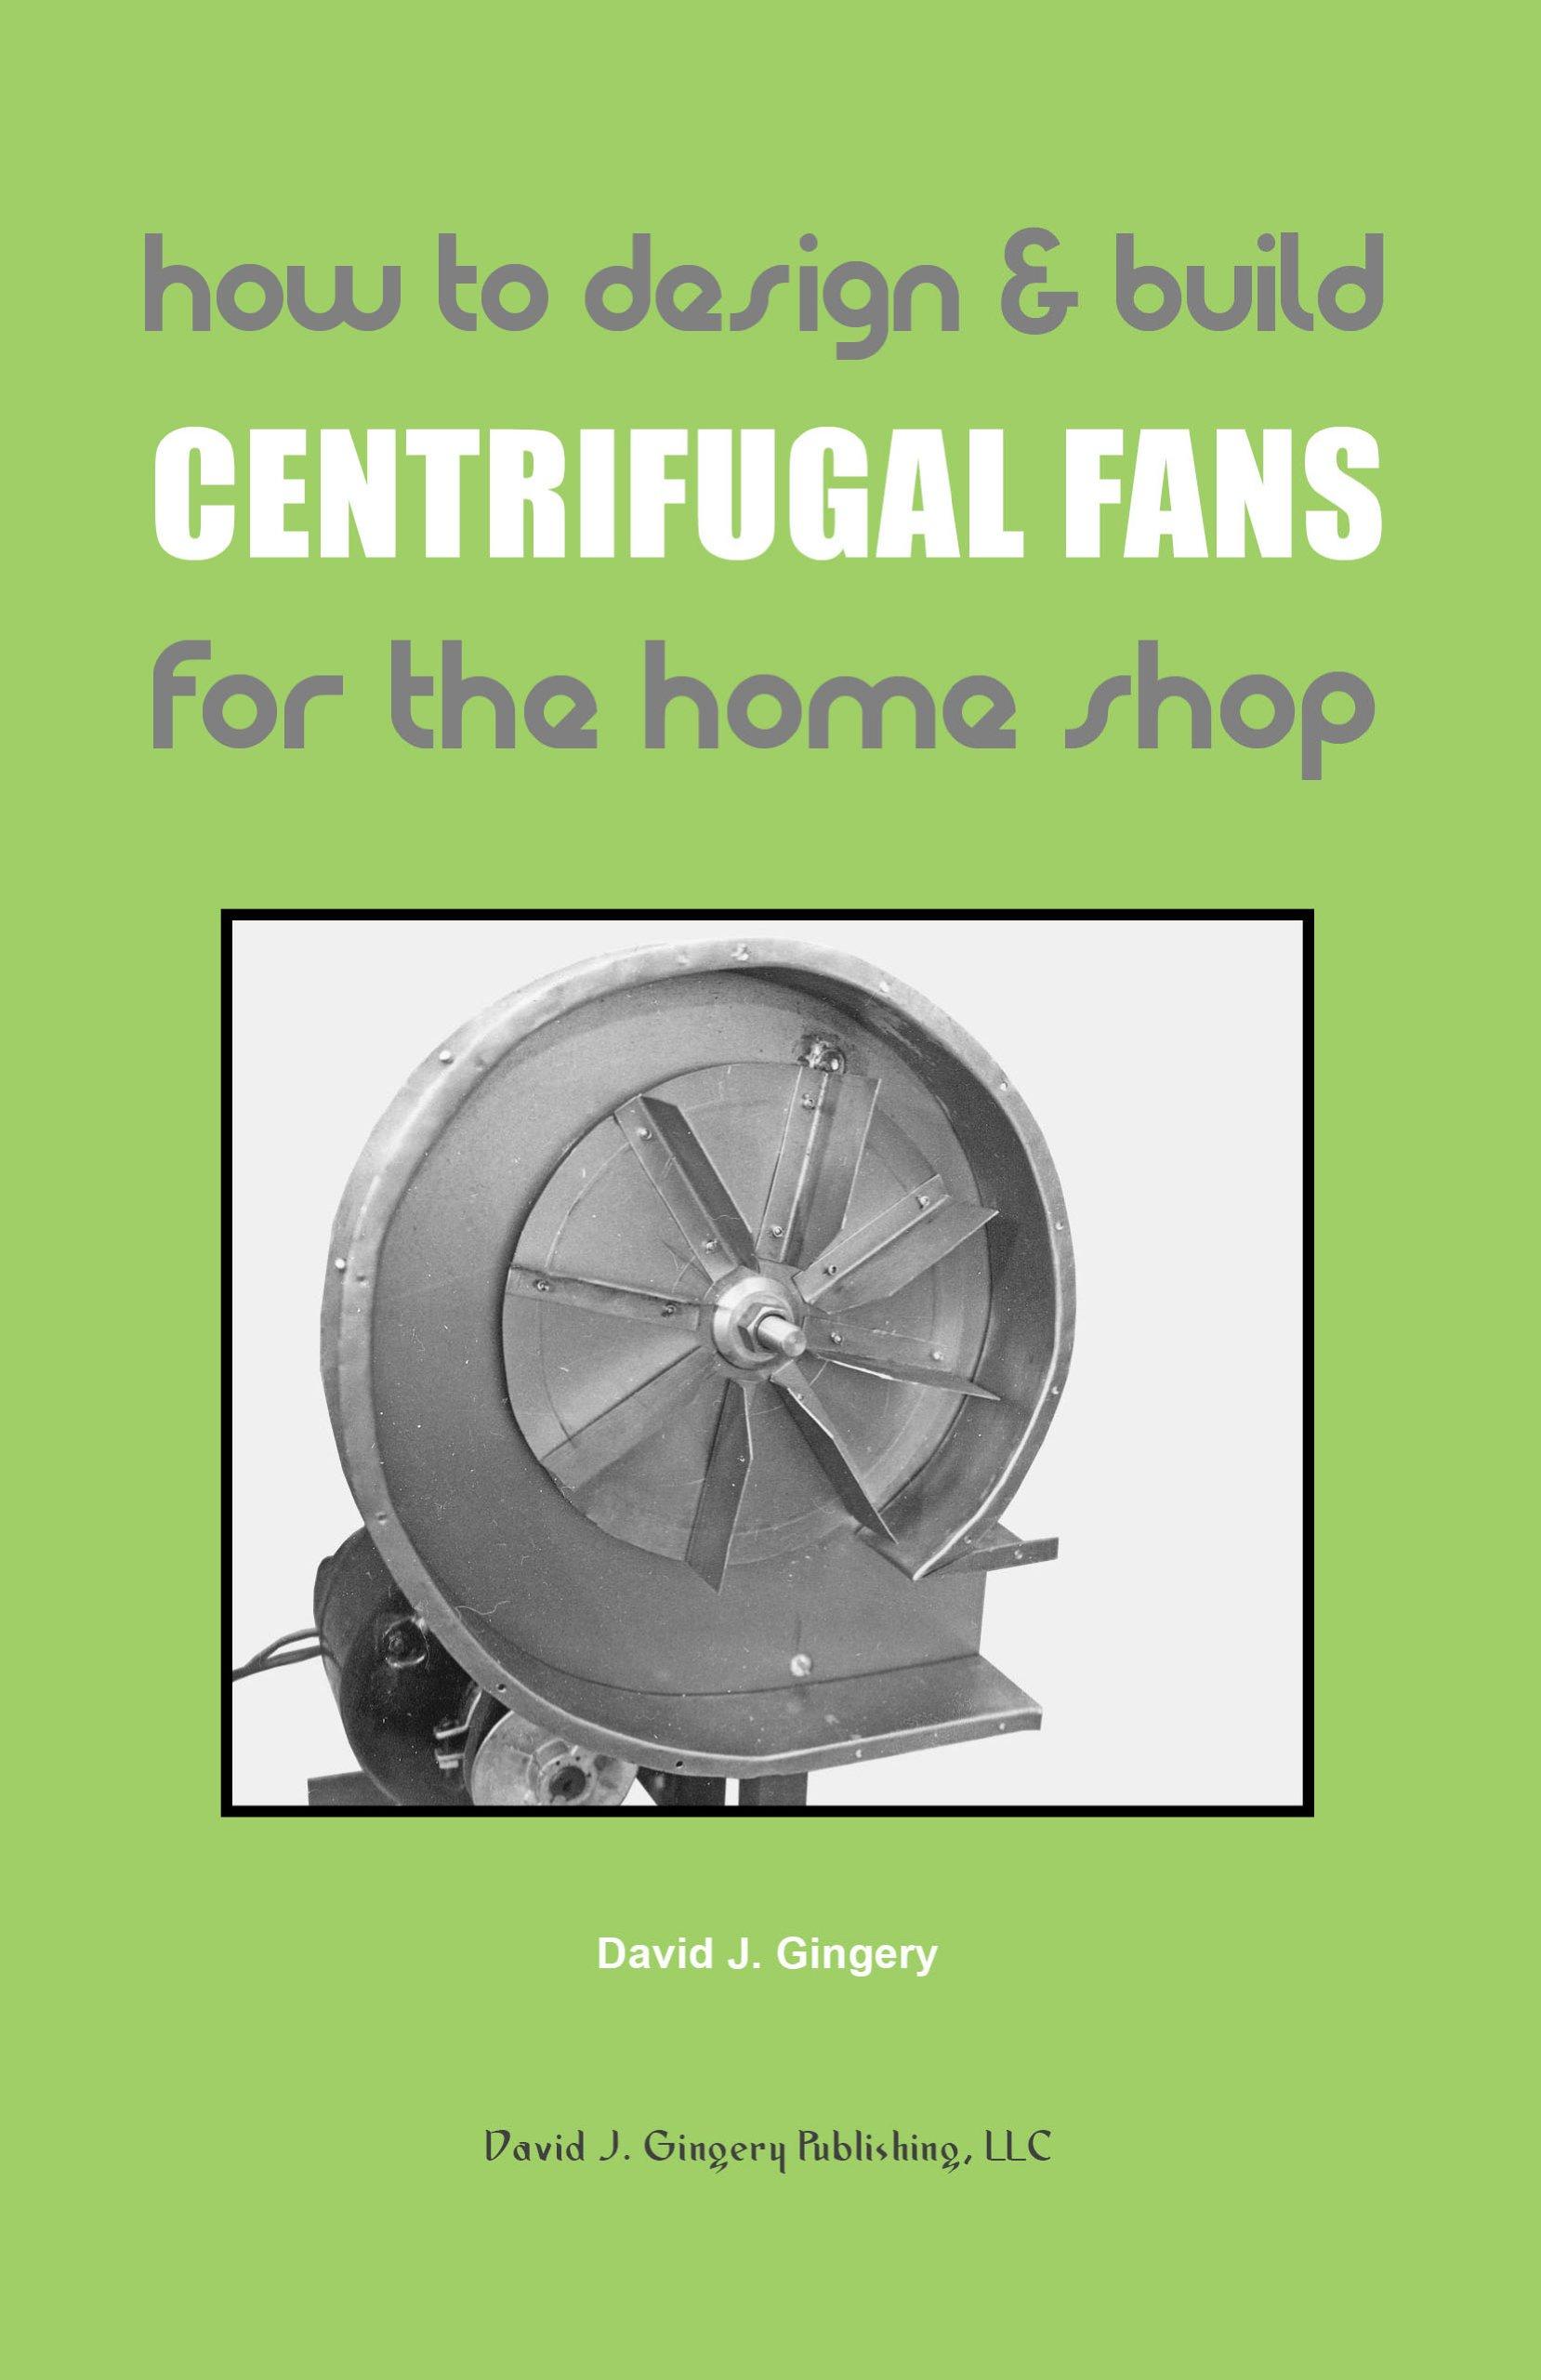 How To Design & Build Centrifugal Fans For the Home Shop: David J